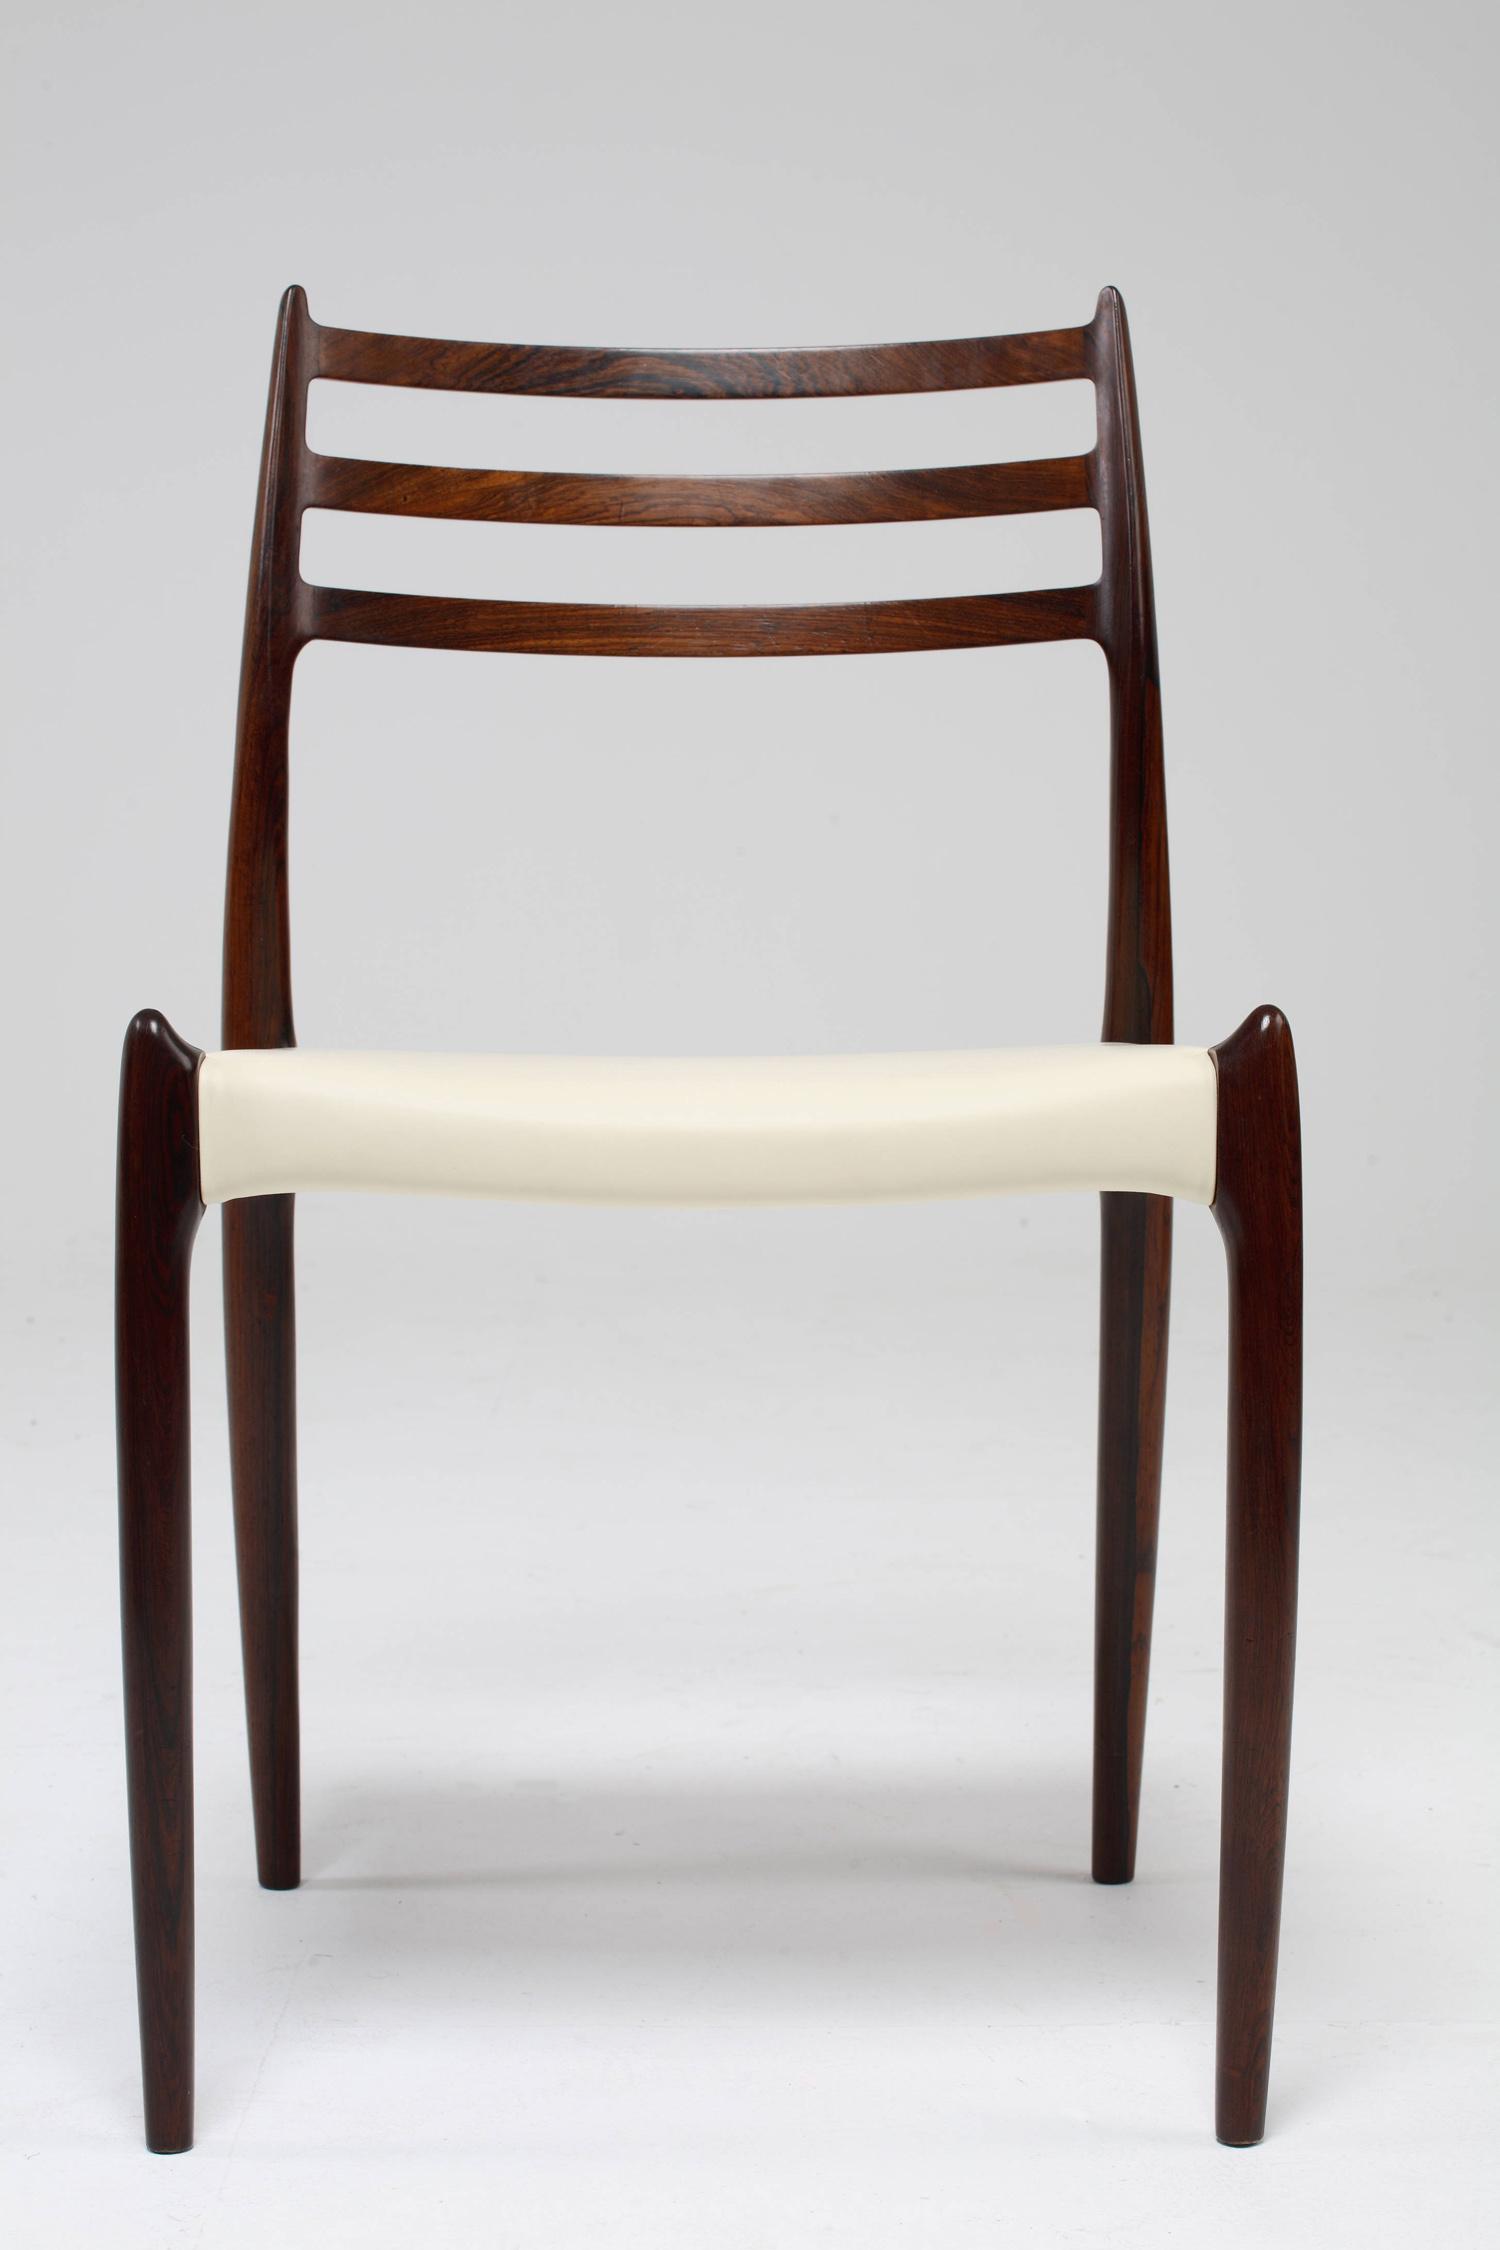 Chair_3_001_resize.jpg